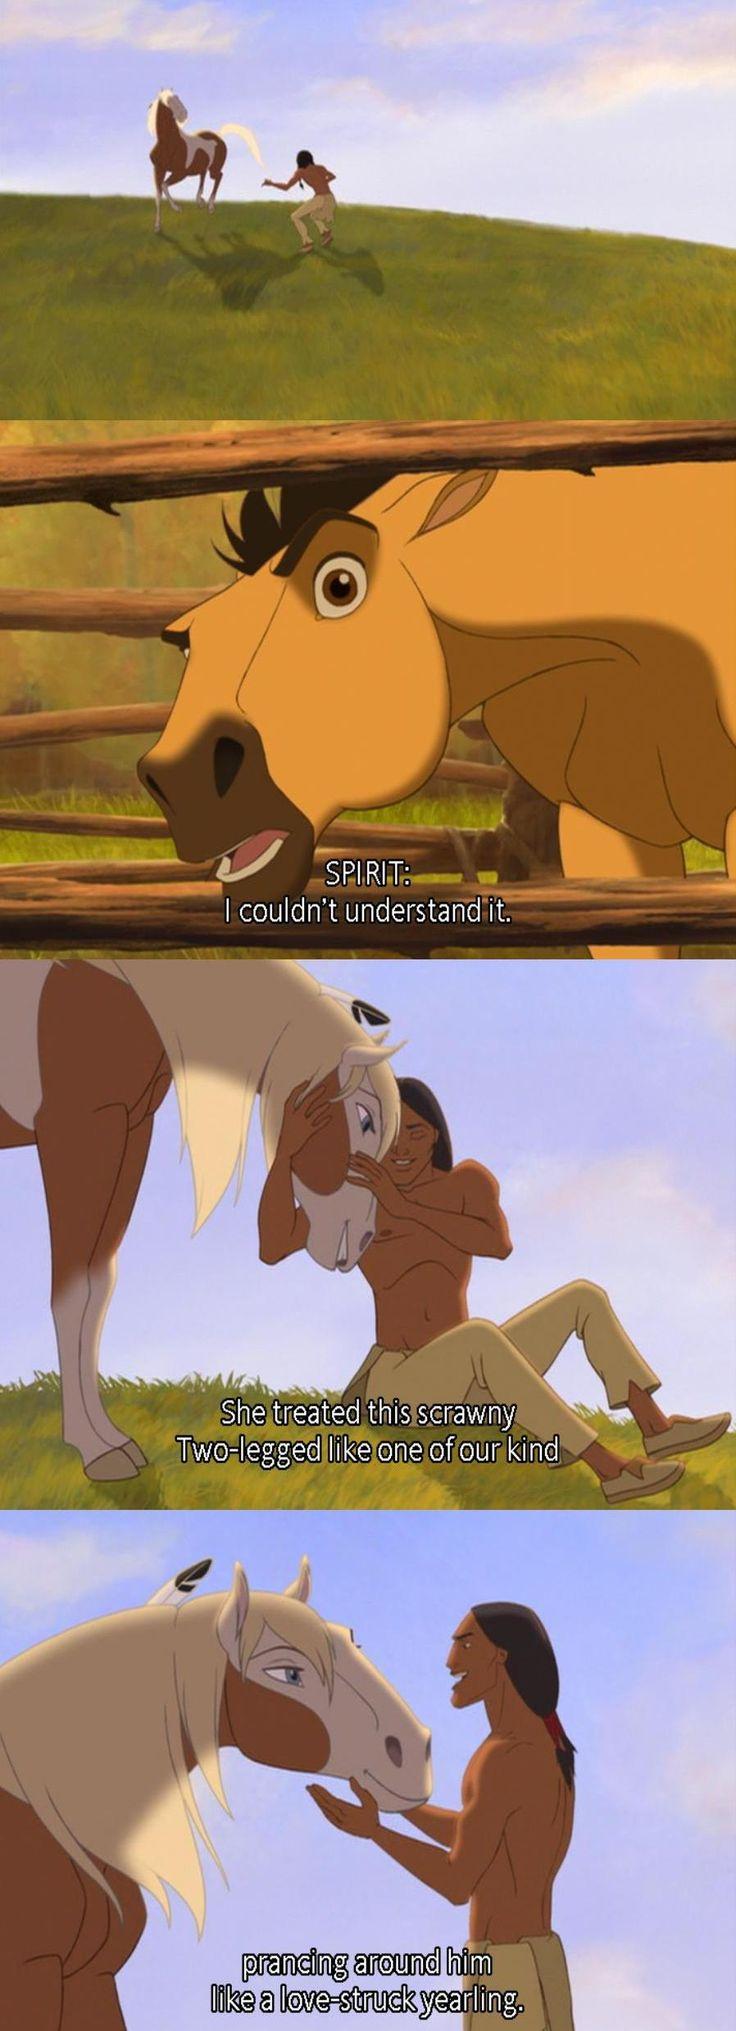 Spirit: Stallion of the Cimarron (Disney) (Dreamworks)